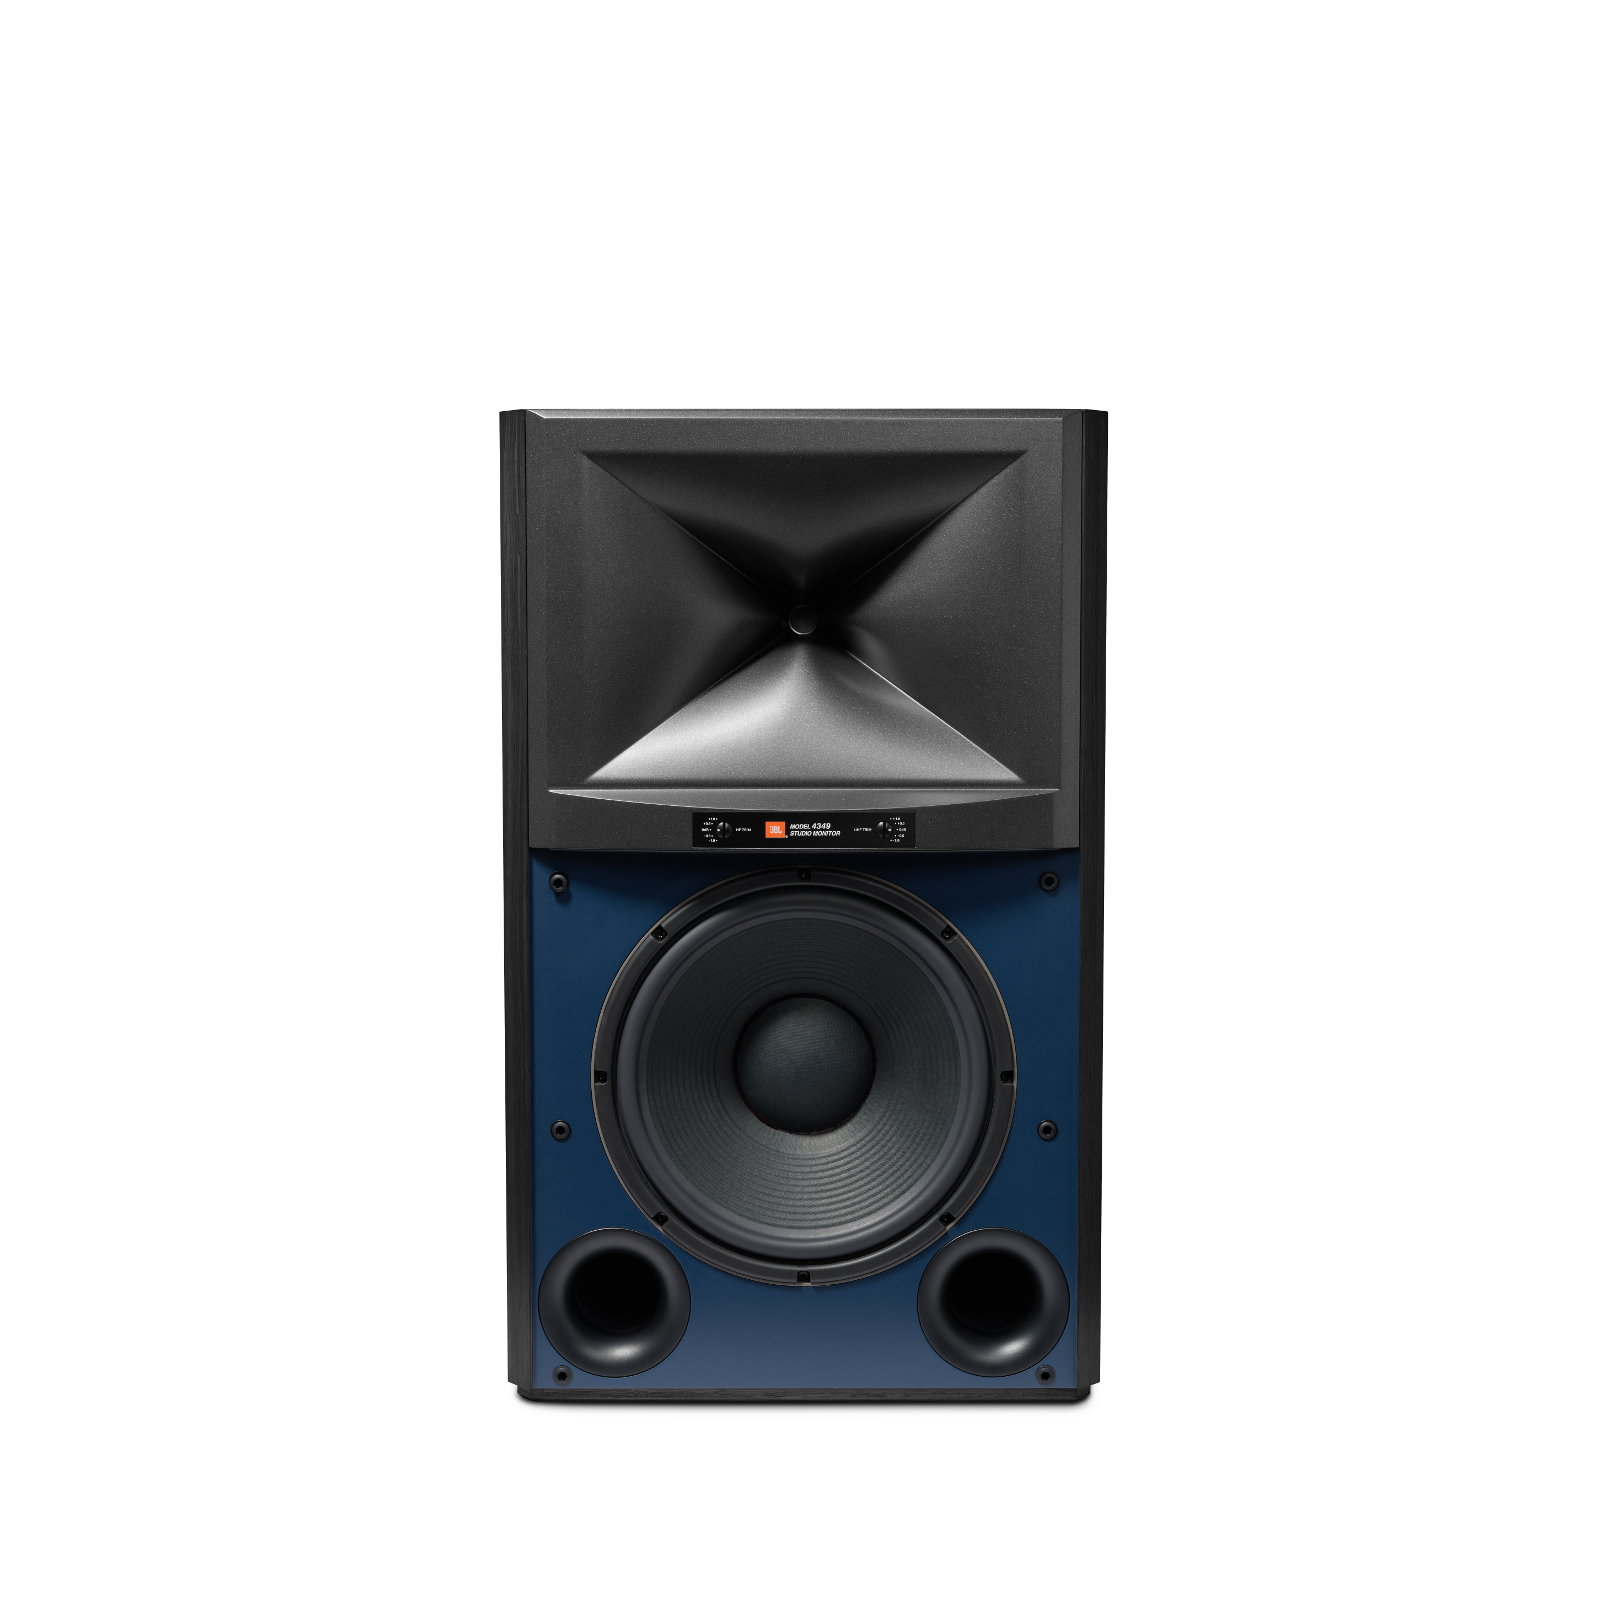 4349 - Black - 12-inch (300mm) 2-way Studio Monitor Loudspeaker - Detailshot 1